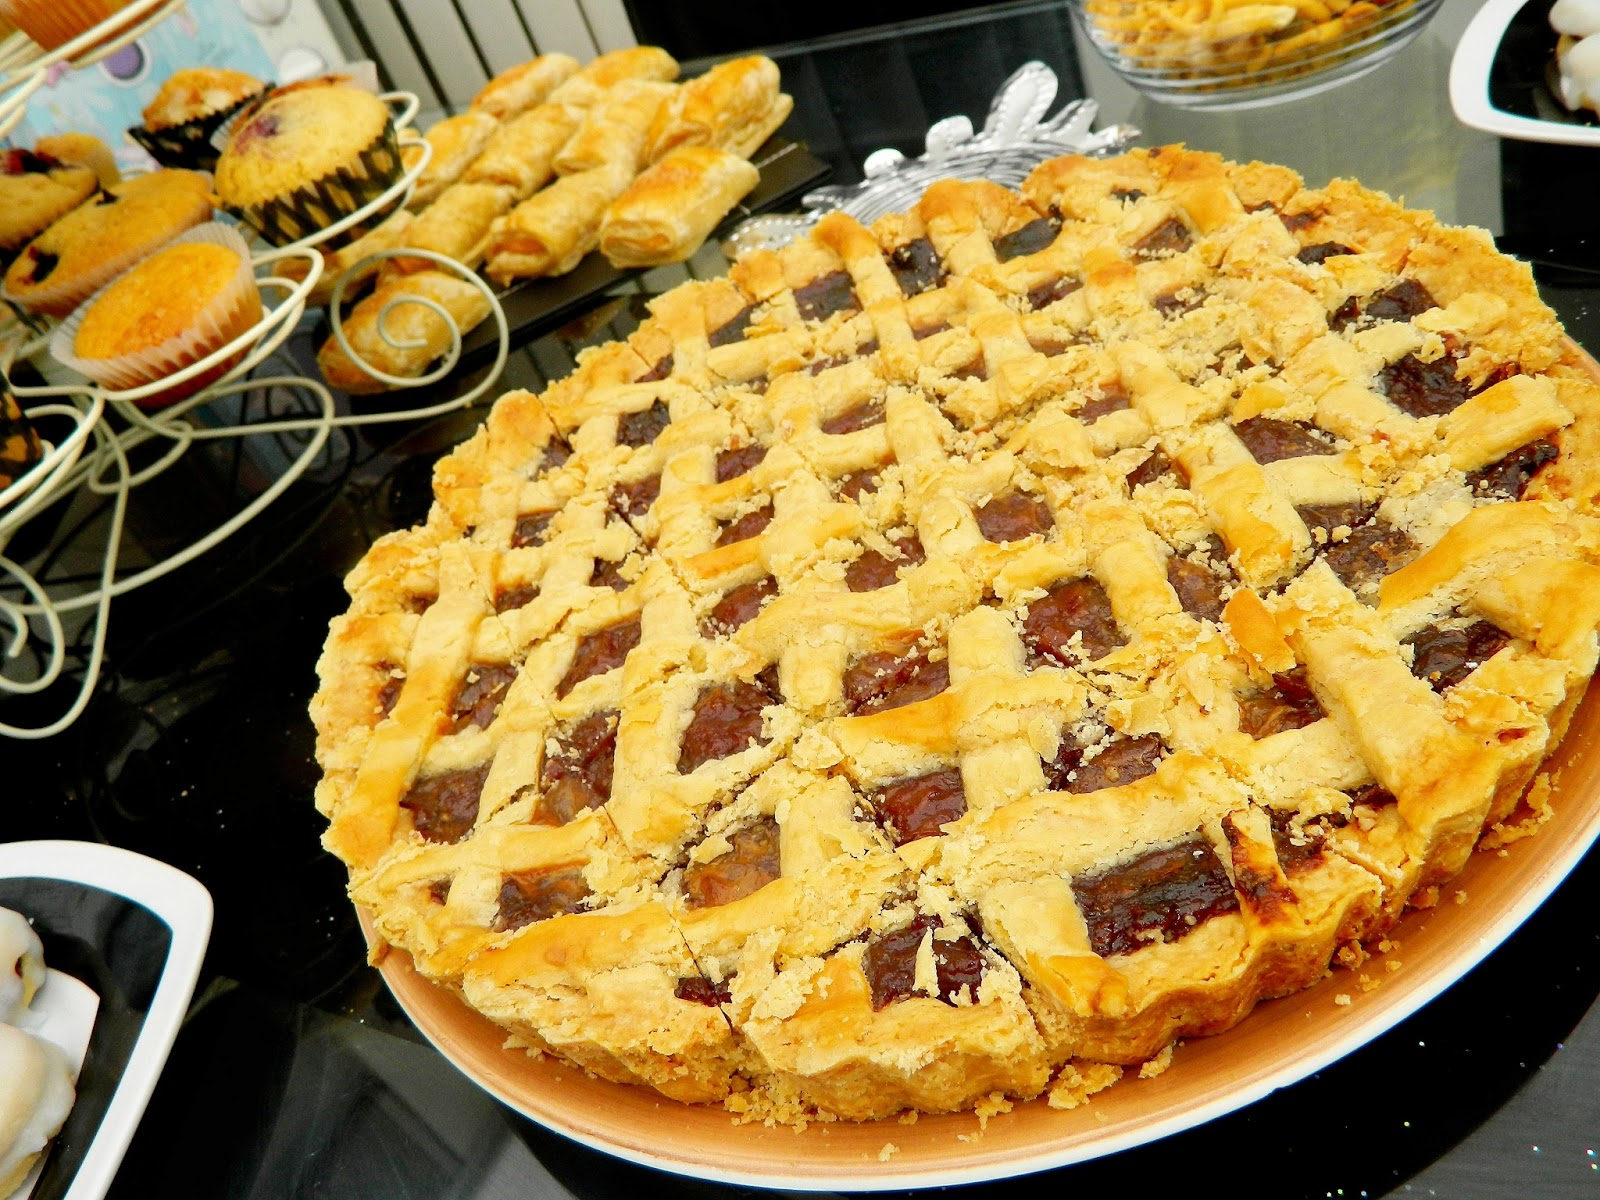 Confessions Of A Foodaholic: Happy 2nd birthday to my lil man.. Ady..